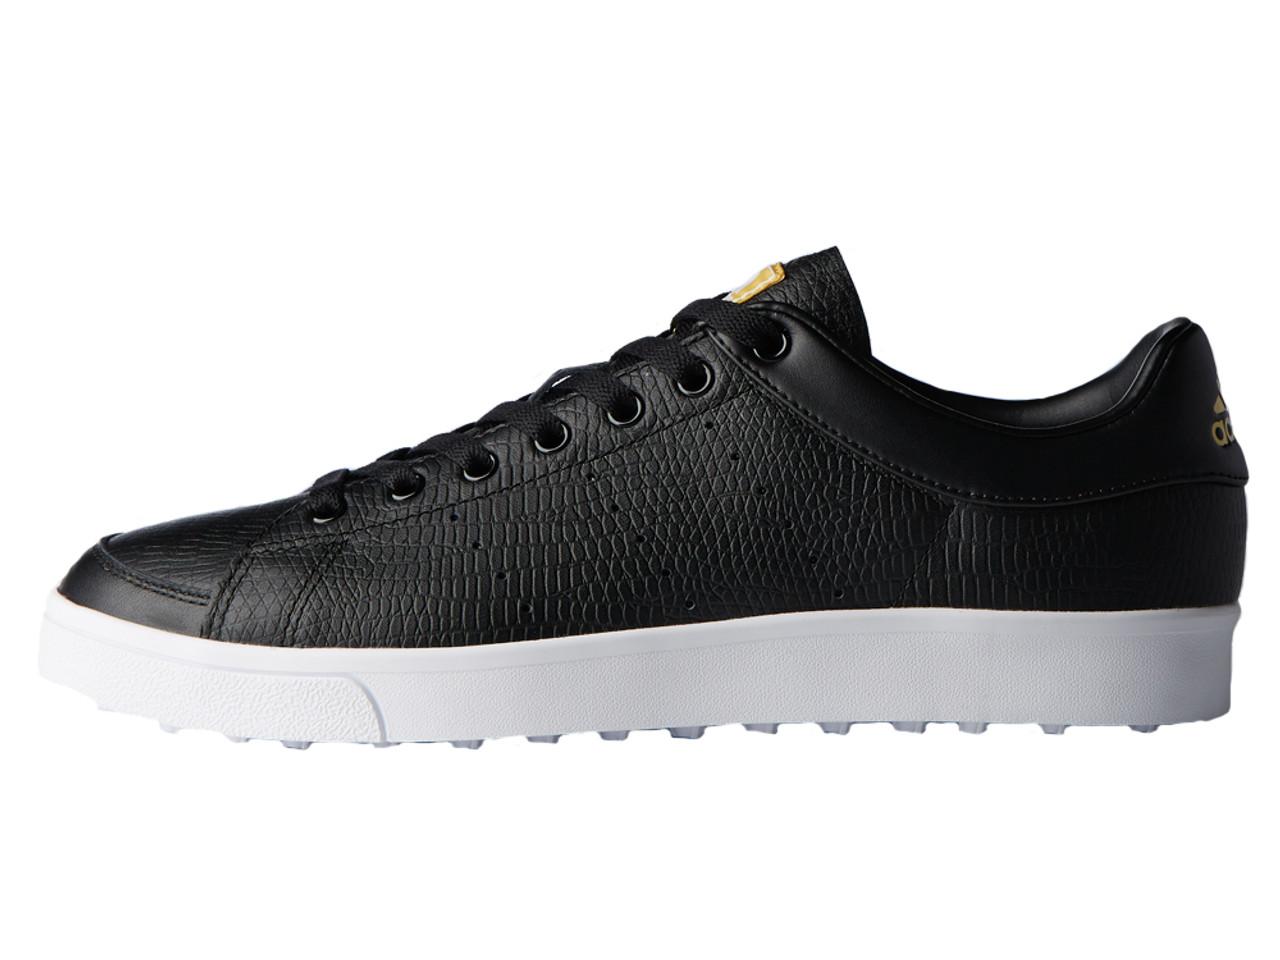 Presunción prometedor construir  Adidas Adicross Classic Golf Shoes - Core Black/FTWR White - Mens ...